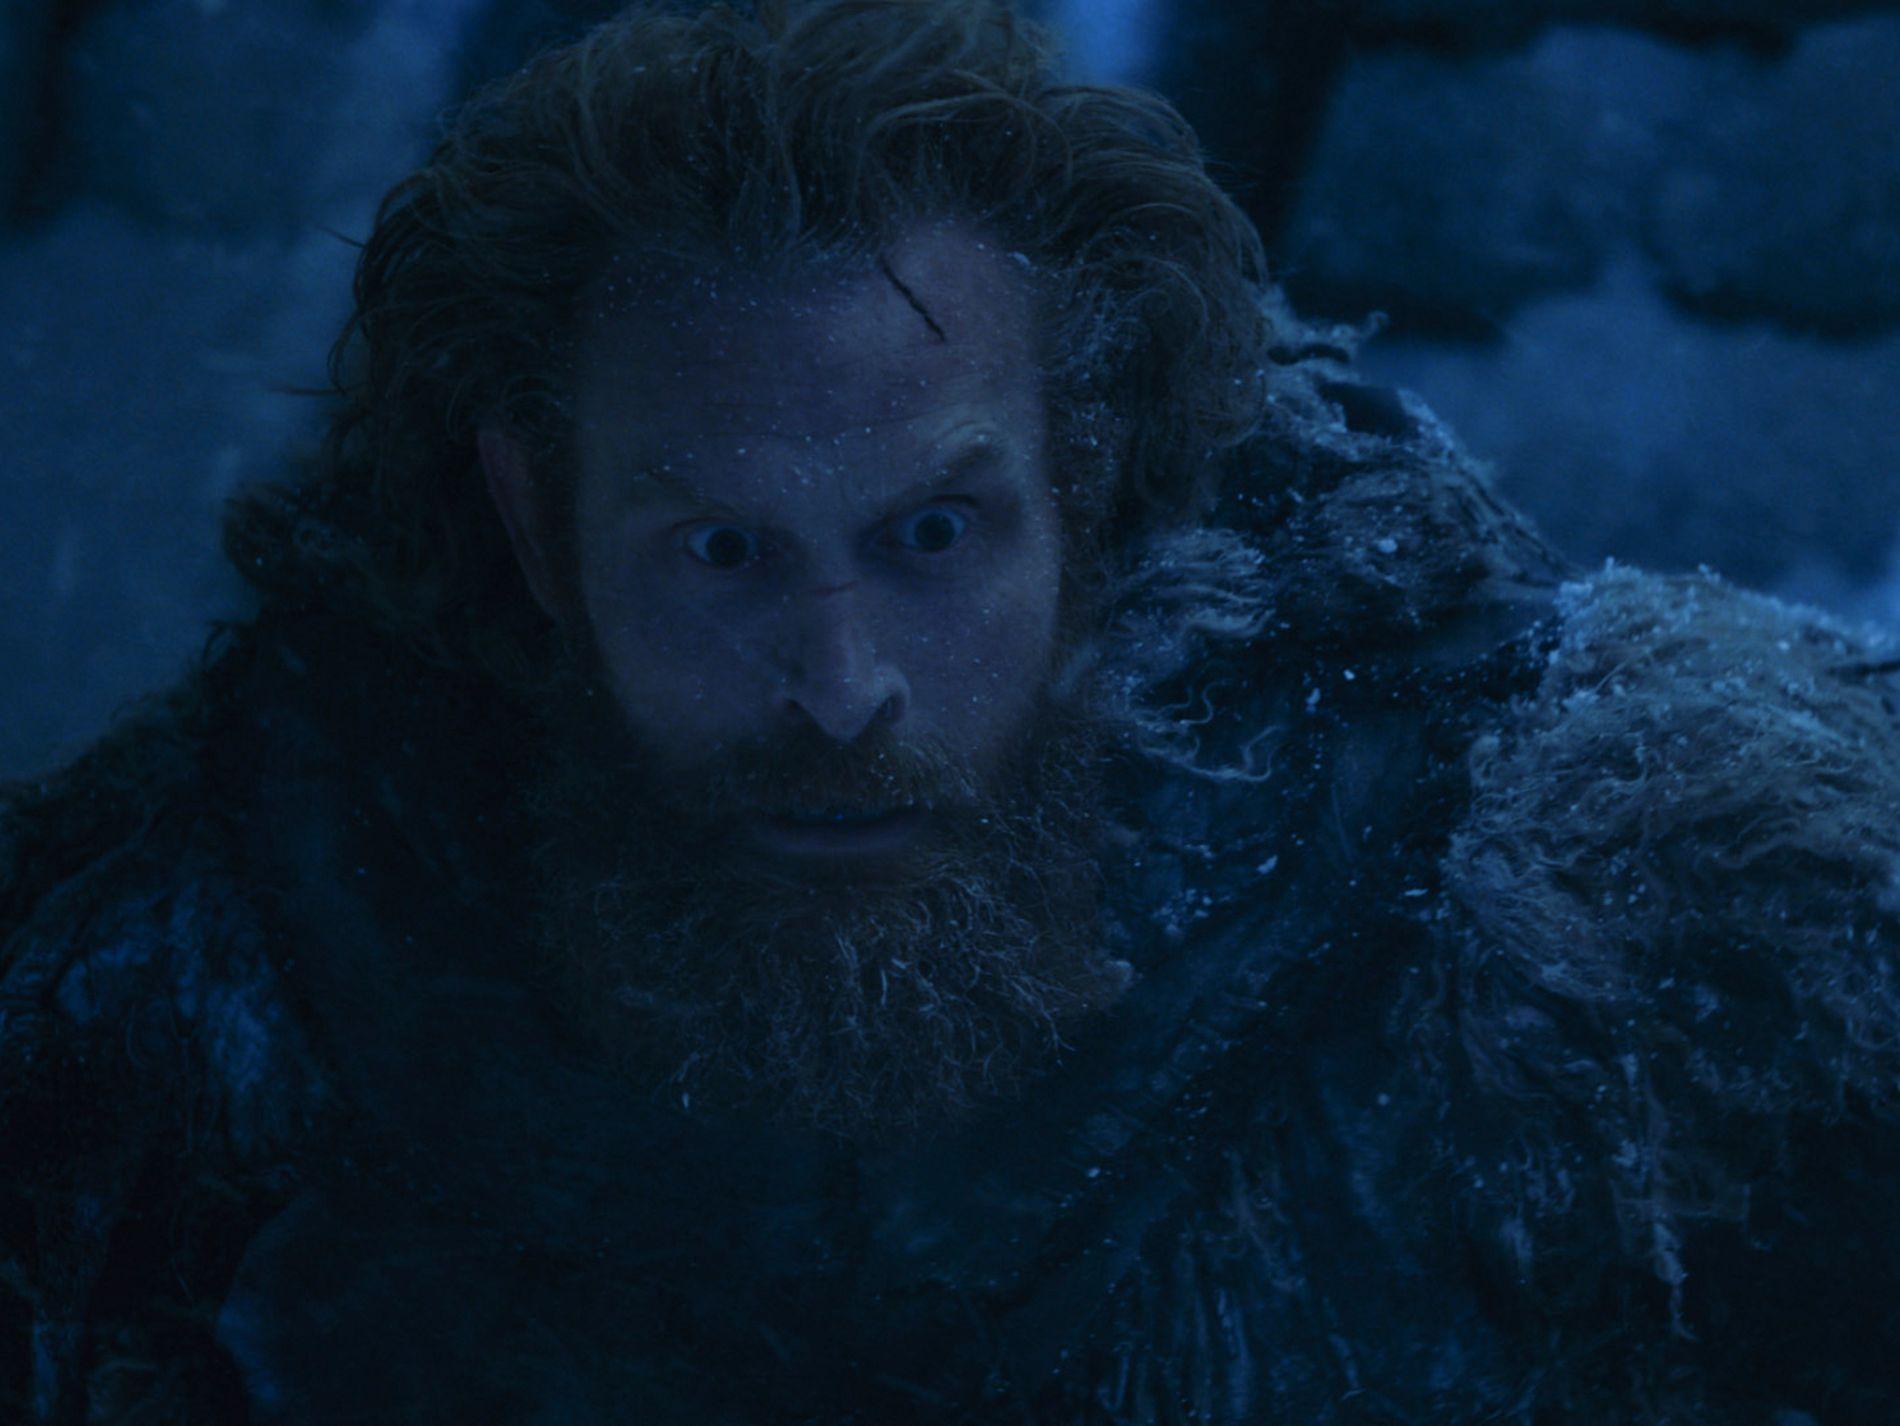 NORSK DELTAKELSE: Kristofer Hivju som Tormund Giantsbane i finalepisoden av sesong 7 (episode 7). Foto: HBO